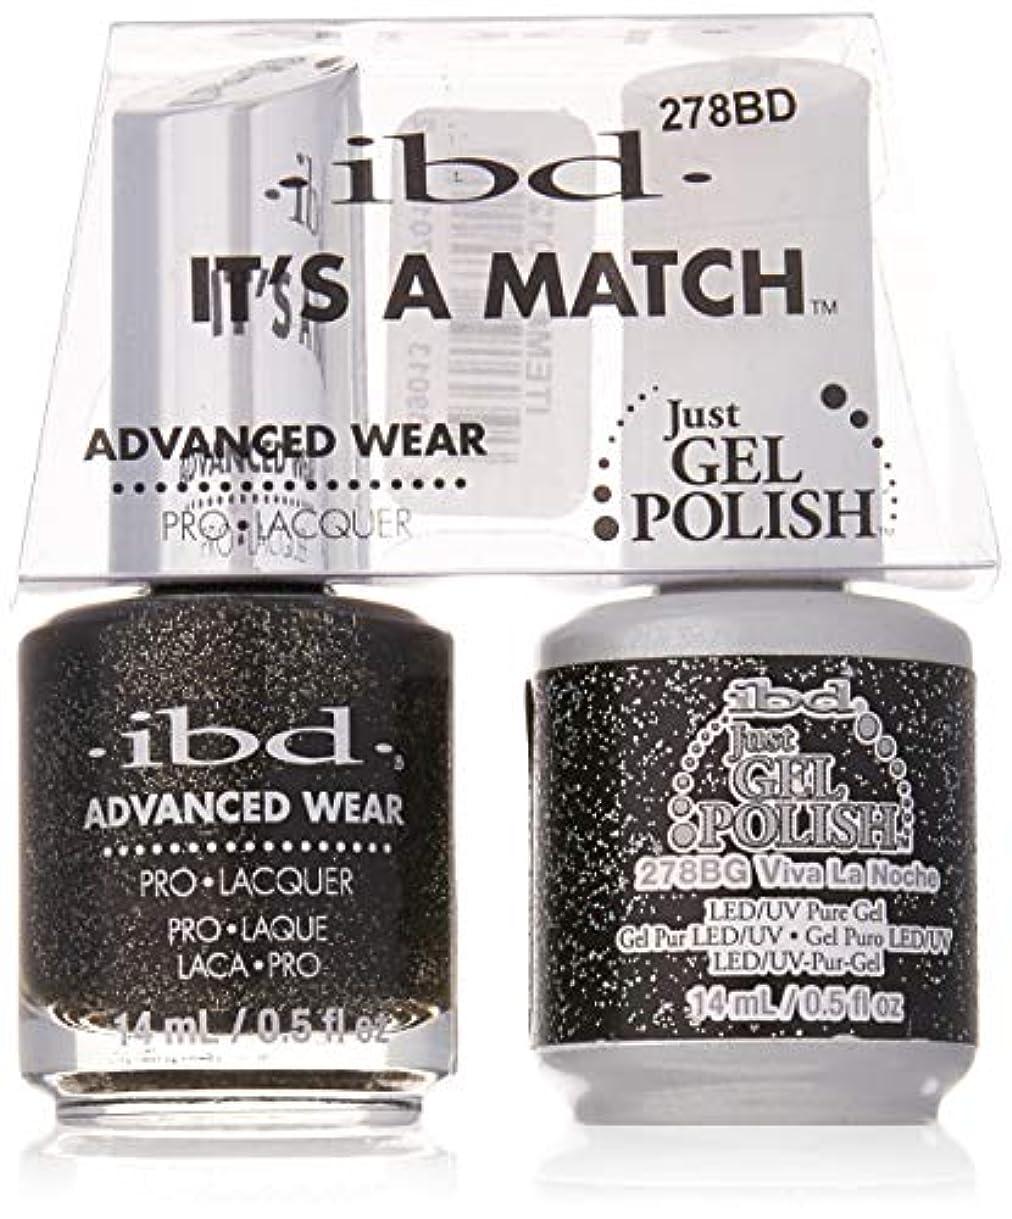 ibd - It's A Match -Duo Pack- Love Lola Collection - Viva La Noche - 14 mL / 0.5 oz Each